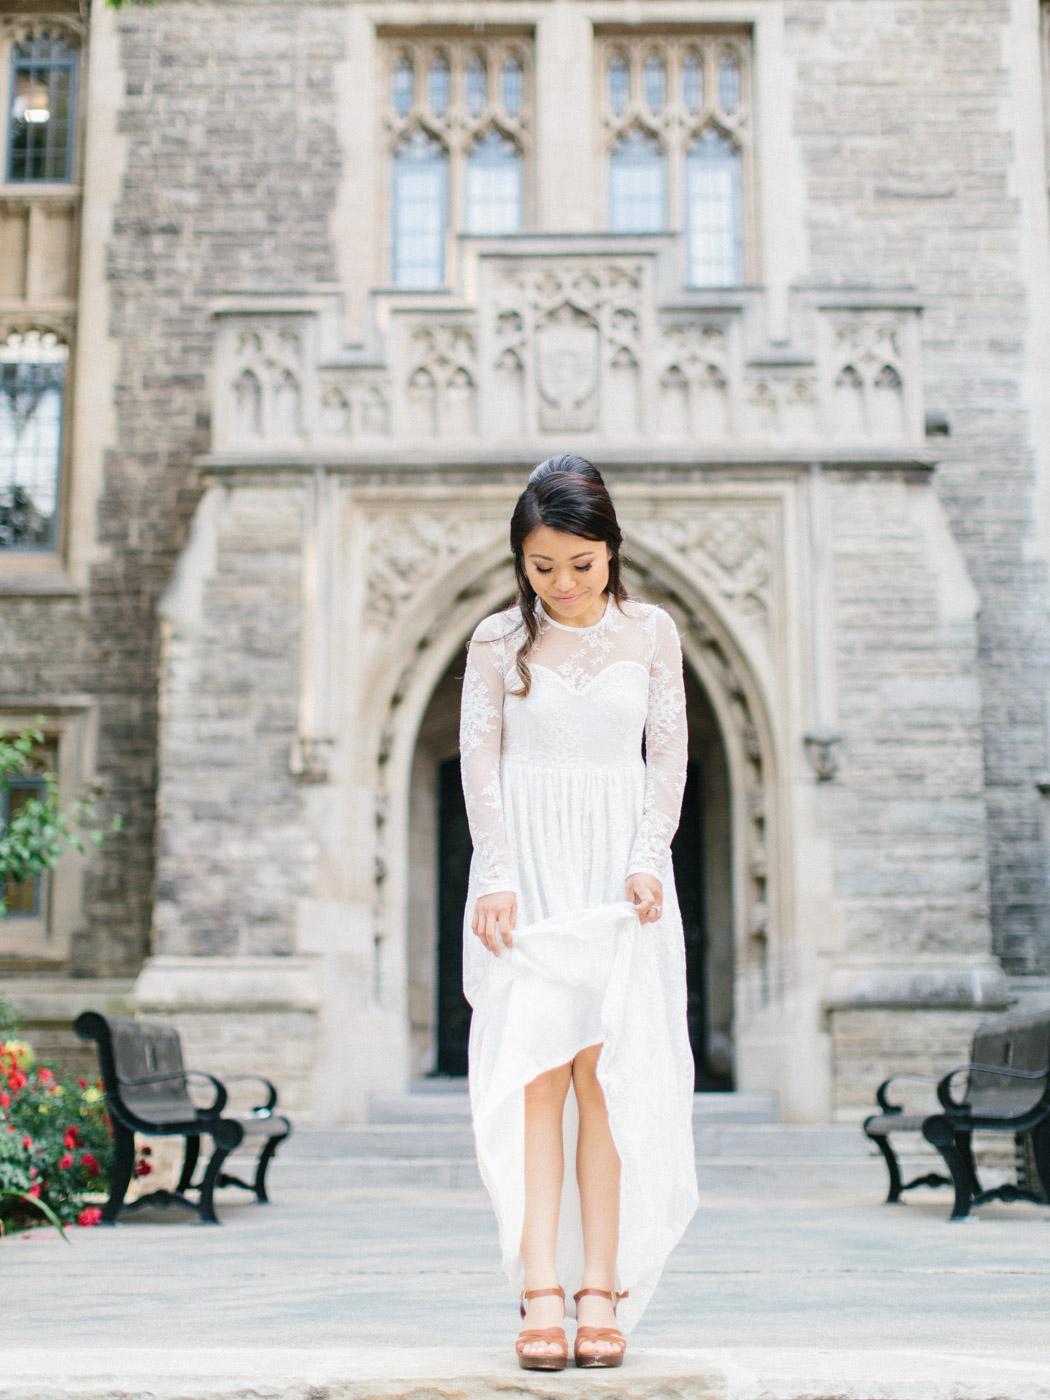 Toronto Wedding Photographer Engagement Photographt at McMaster University in Hamilton